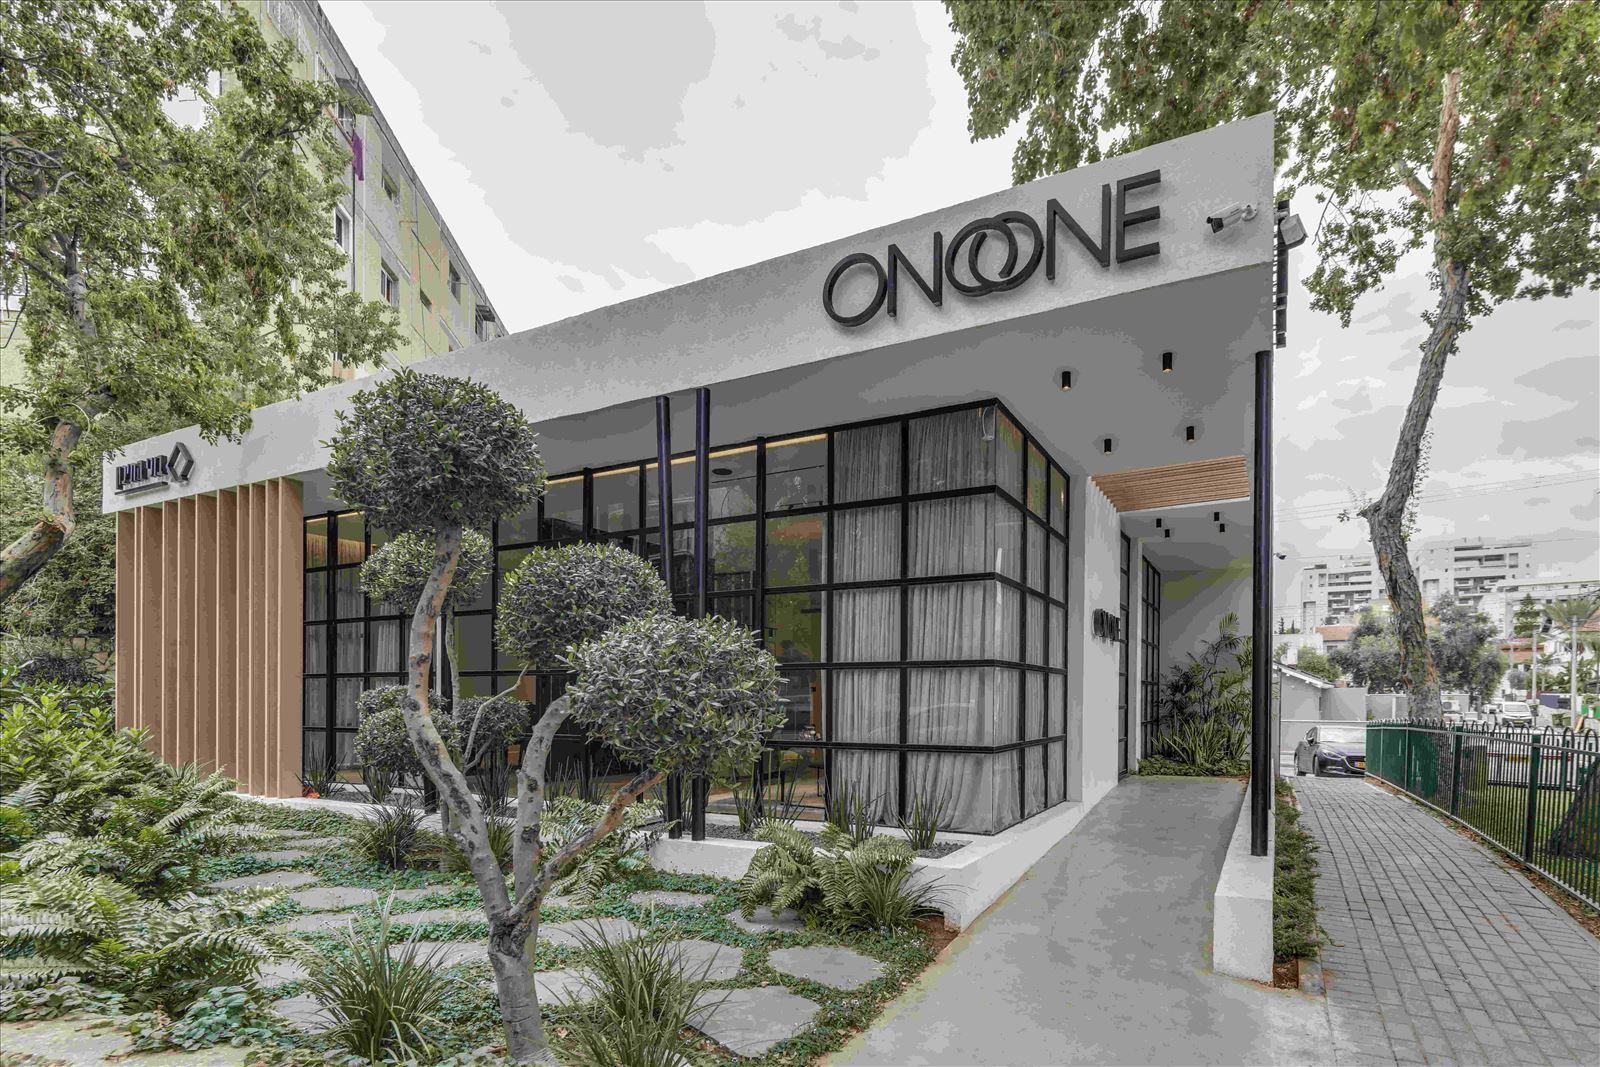 sales office - onone תמונה של גופי תאורה חיצוניים